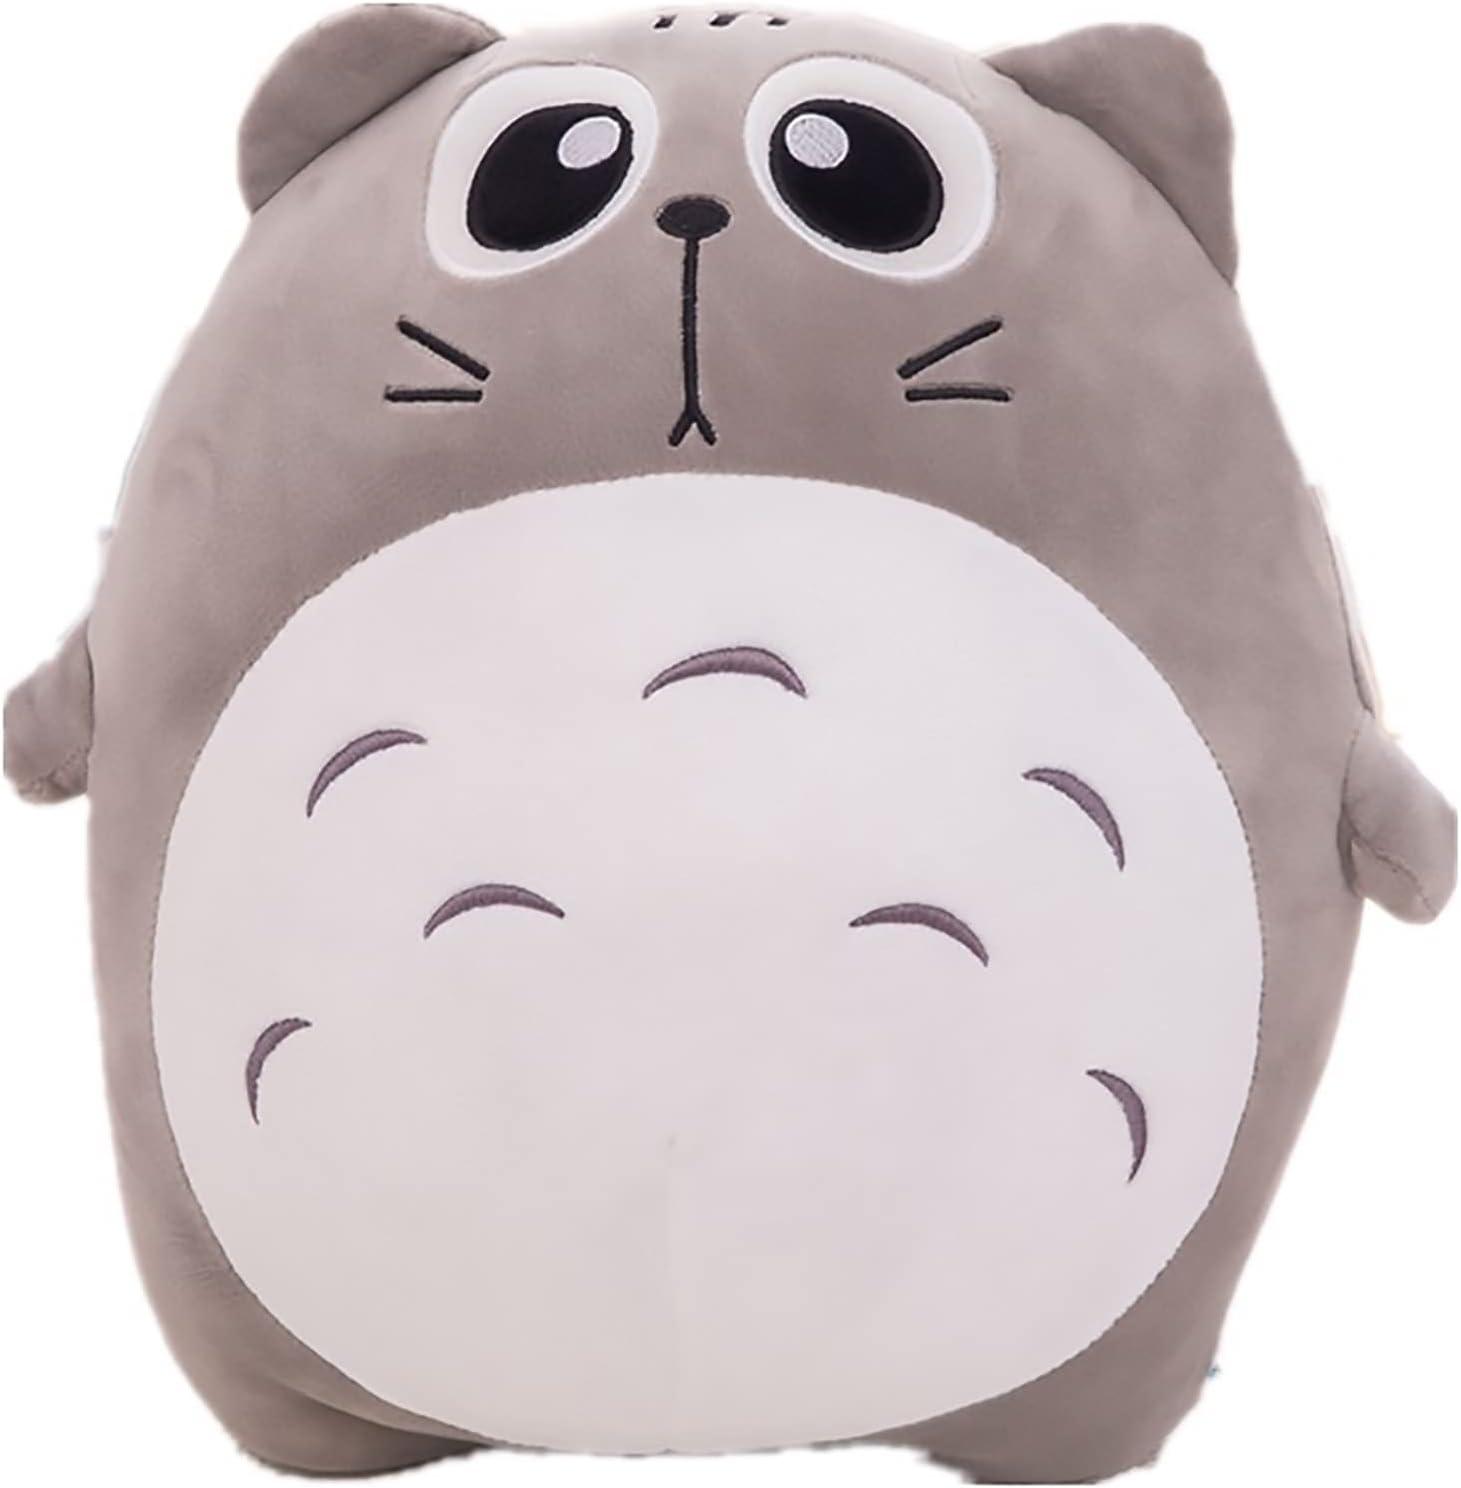 Totoro Plush Toy Austin Mall Max 53% OFF Animals Soft Pillow Press Cushion Cute Wedding